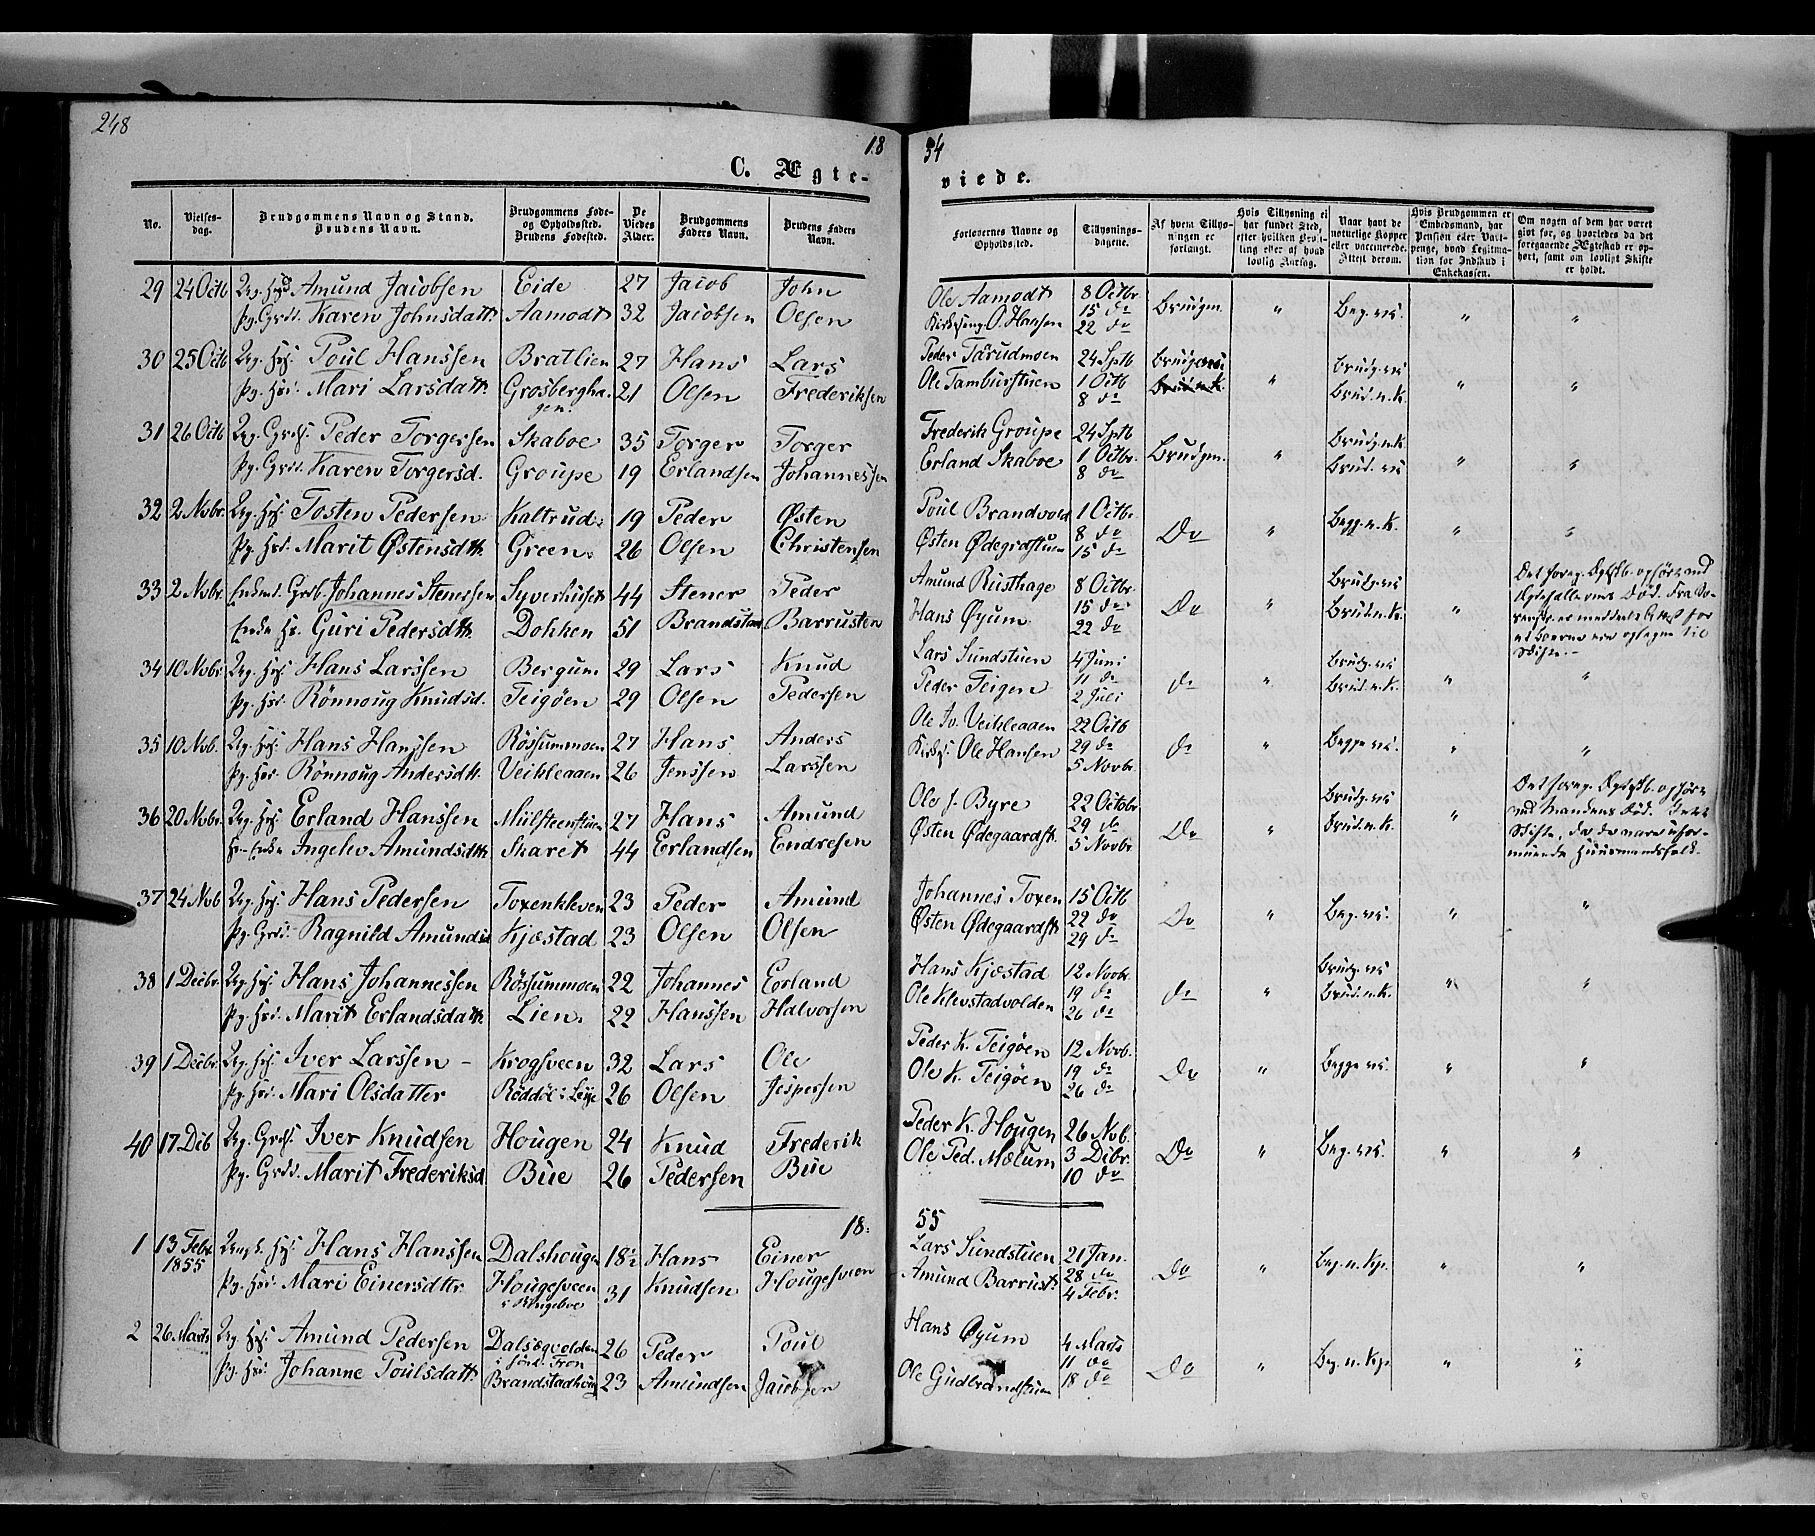 SAH, Nord-Fron prestekontor, Ministerialbok nr. 1, 1851-1864, s. 248